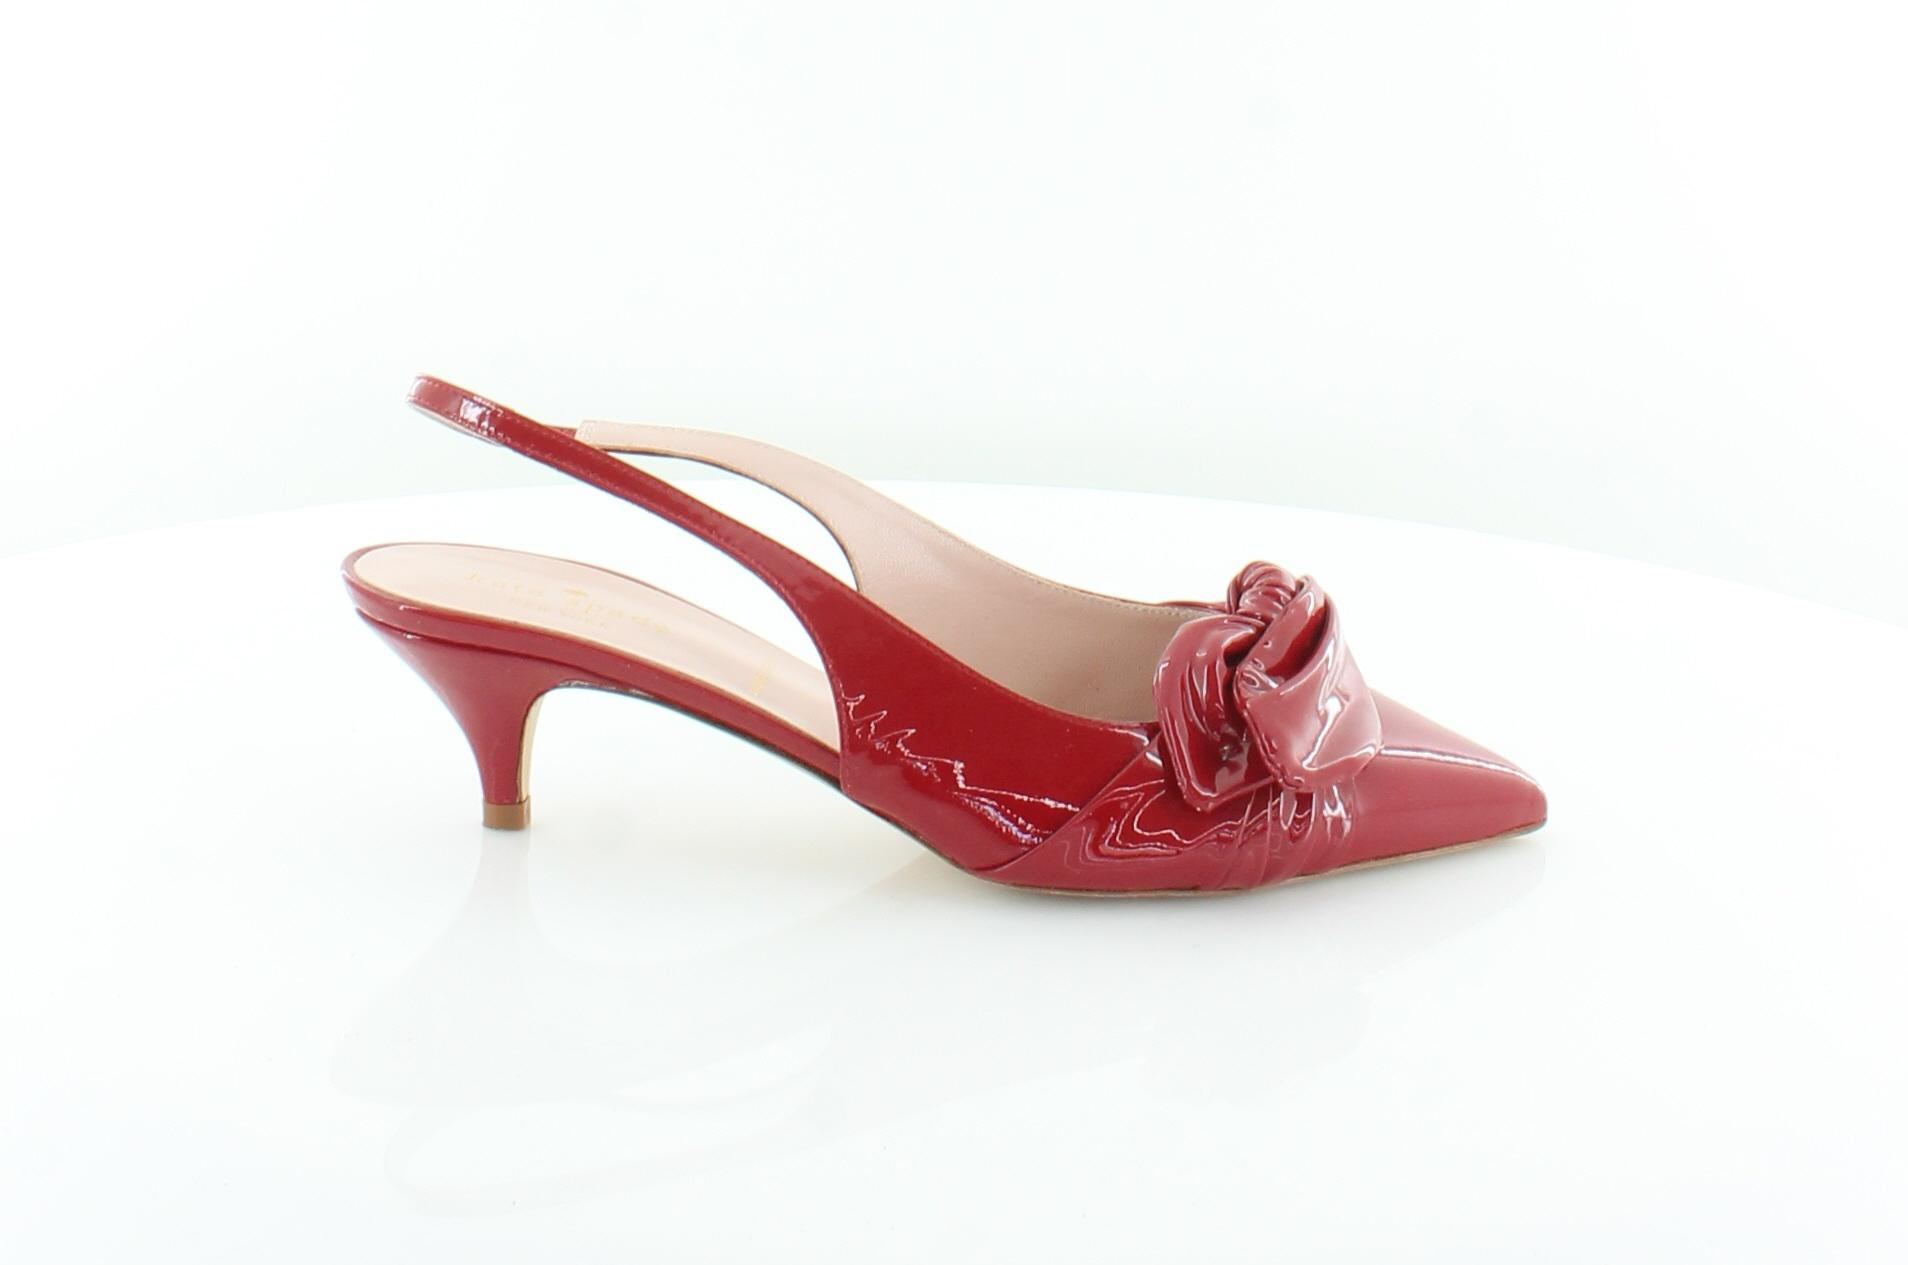 Kate Spade Ophelia rot damen schuhe Größe 7.5 M Heels MSRP  278